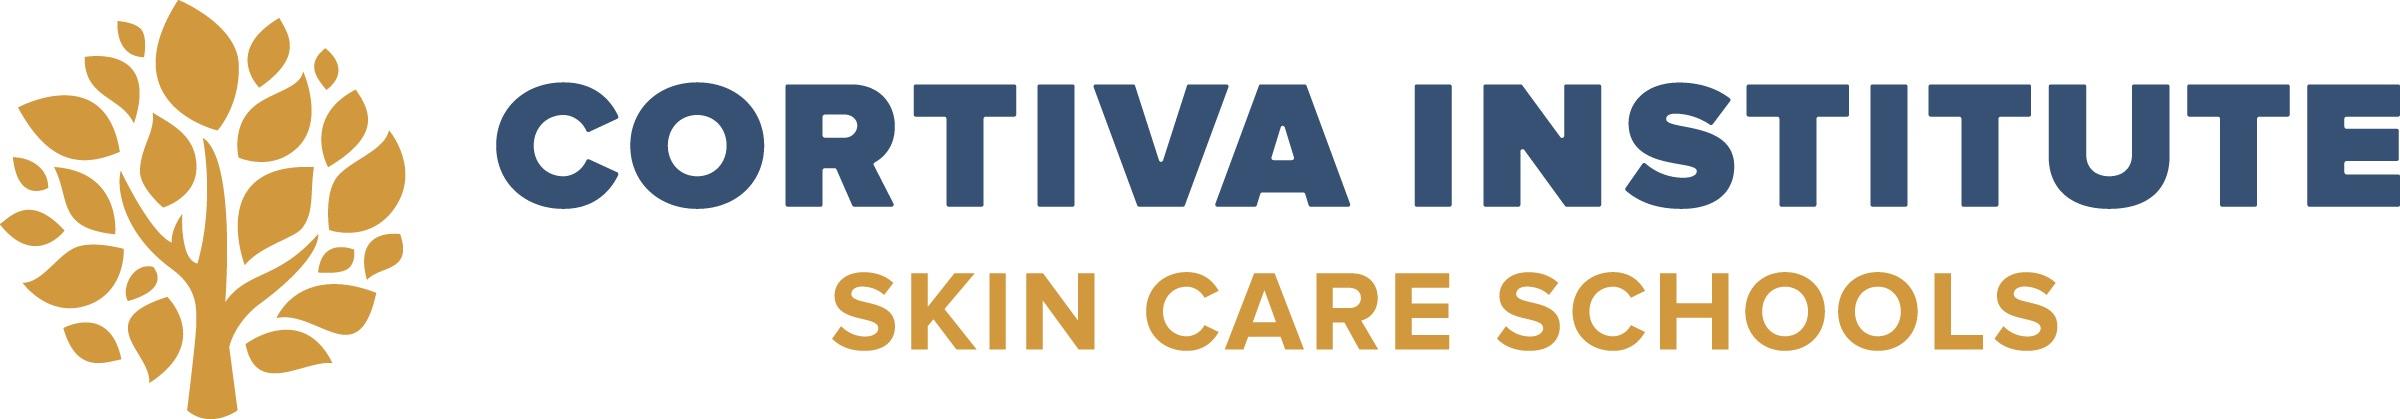 Cortiva Institute - Skin Care Schools